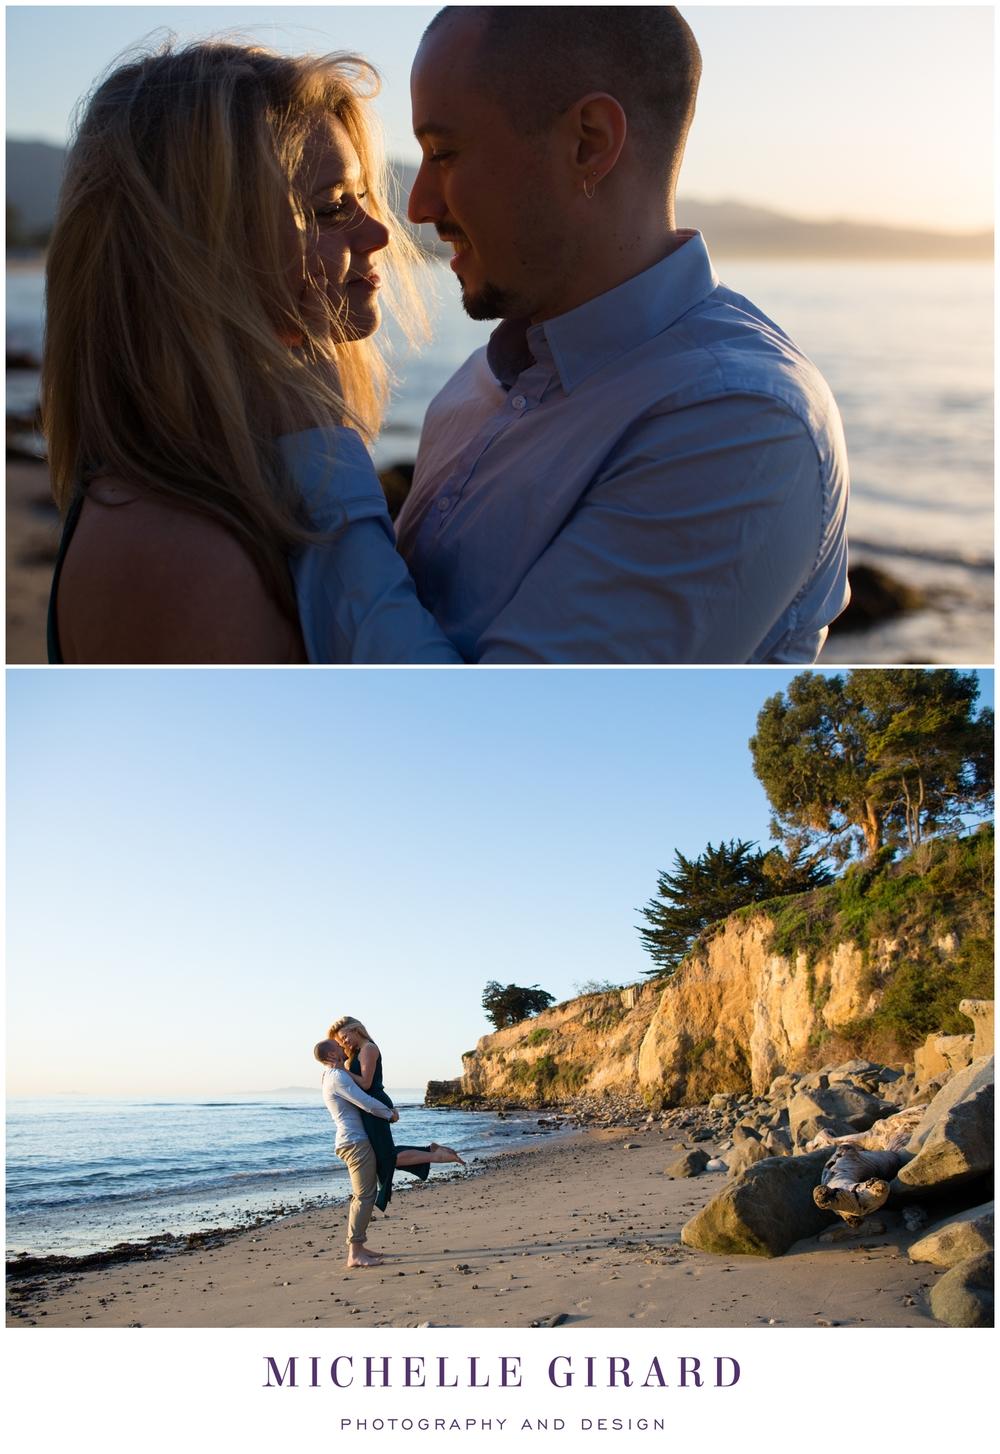 santa-barbara-california-engagement-photography-sunrise-theater-beach-michelle-girard01.jpg